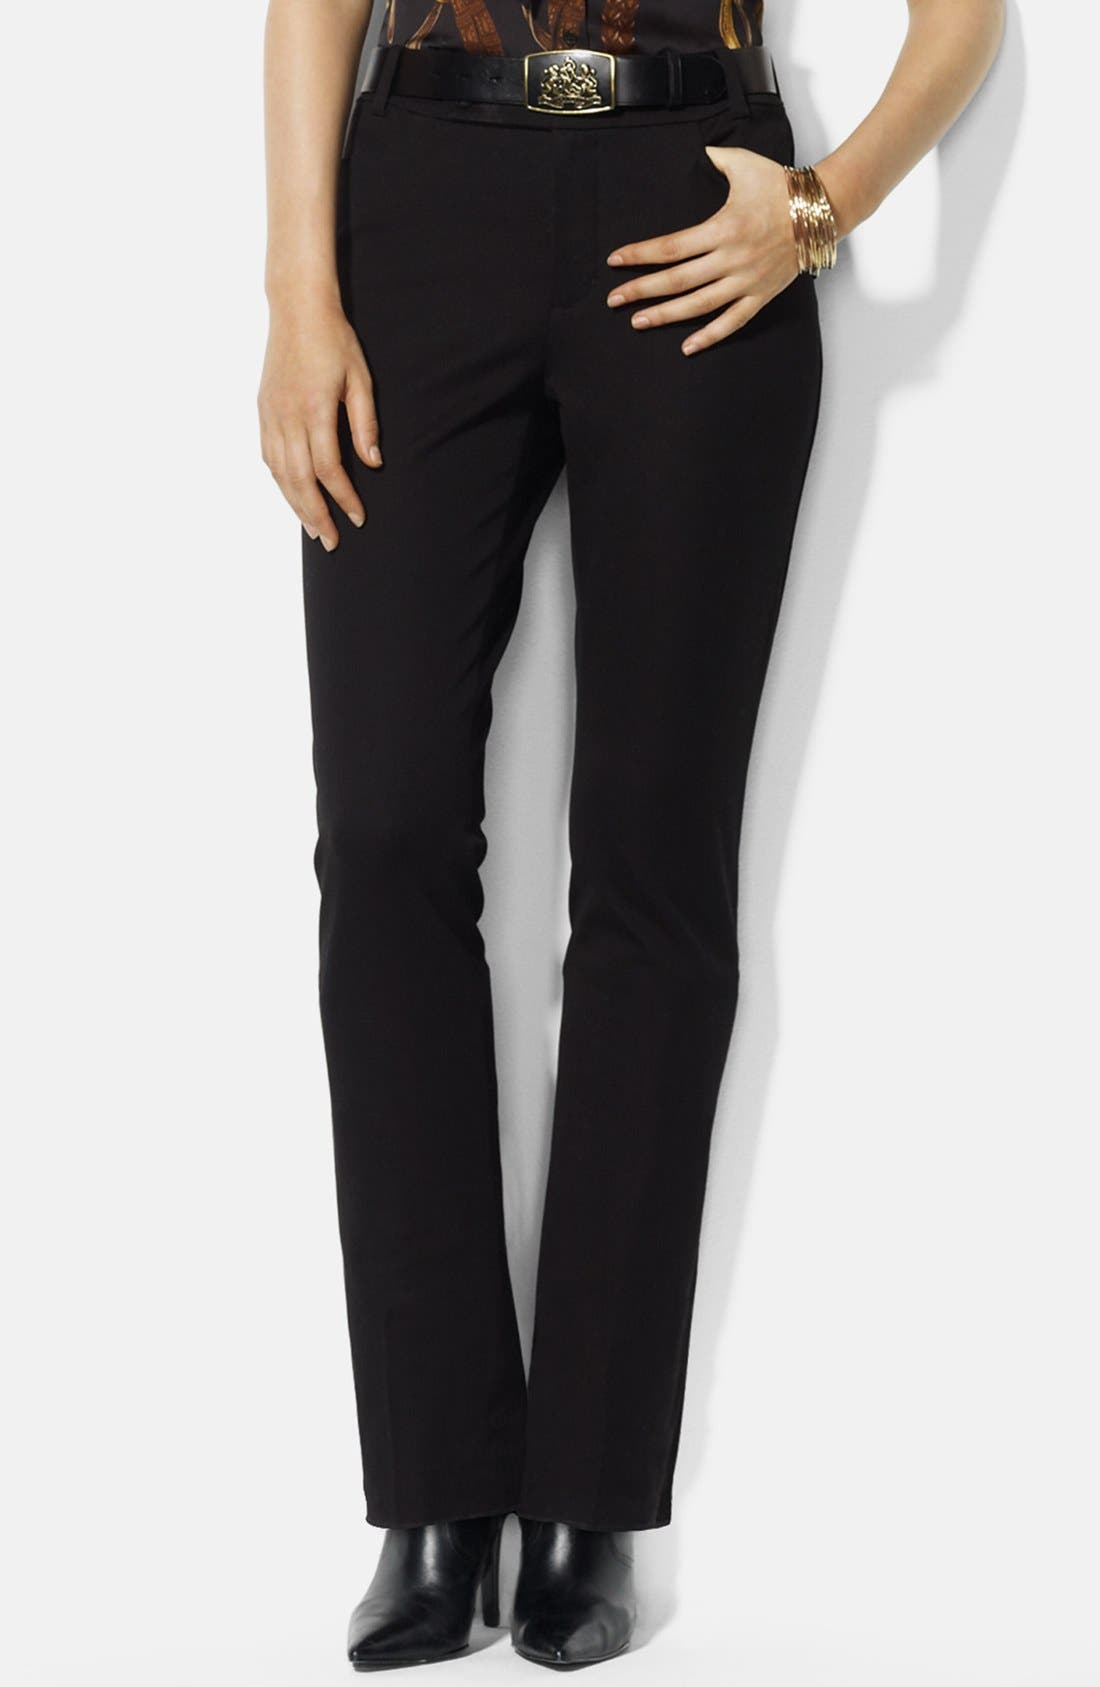 Alternate Image 1 Selected - Lauren Ralph Lauren Stretch Twill Pants (Petite)